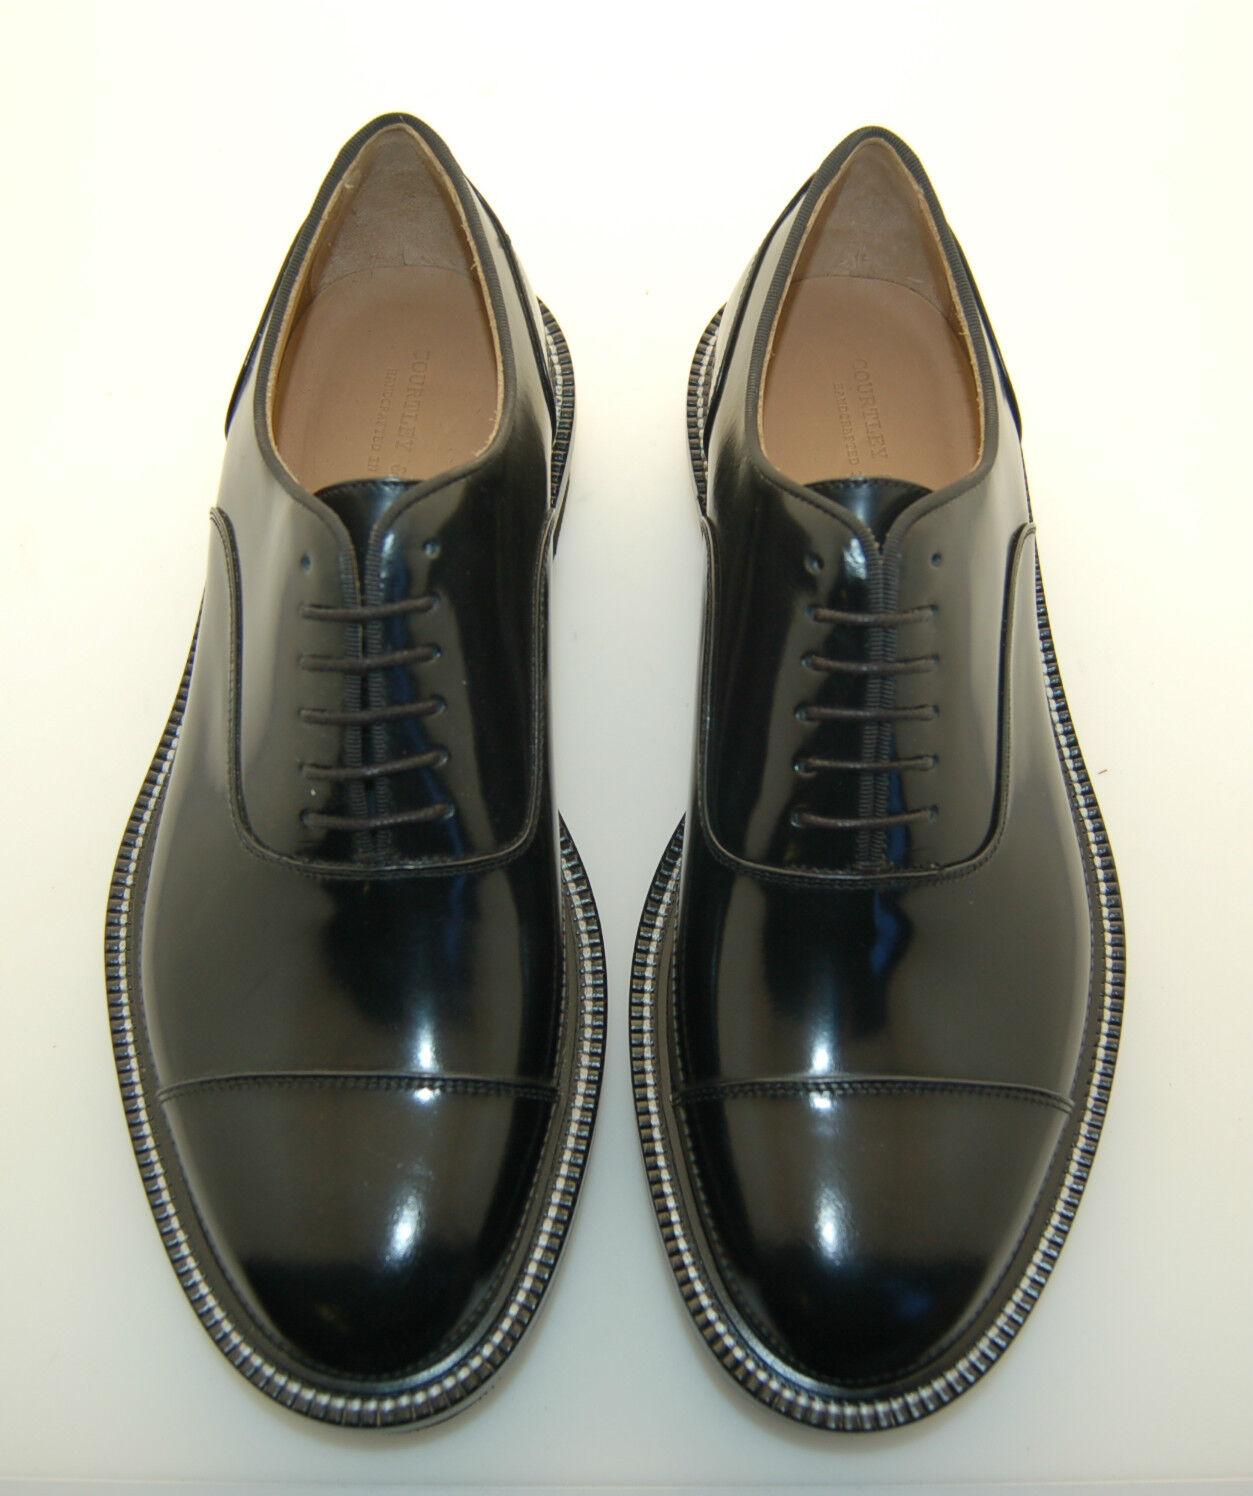 MAN - 42 - 8eu - OXFORD CAPTOE - FRANCESINA - CALF BLACK - LTHR+ RUBBER SOLE